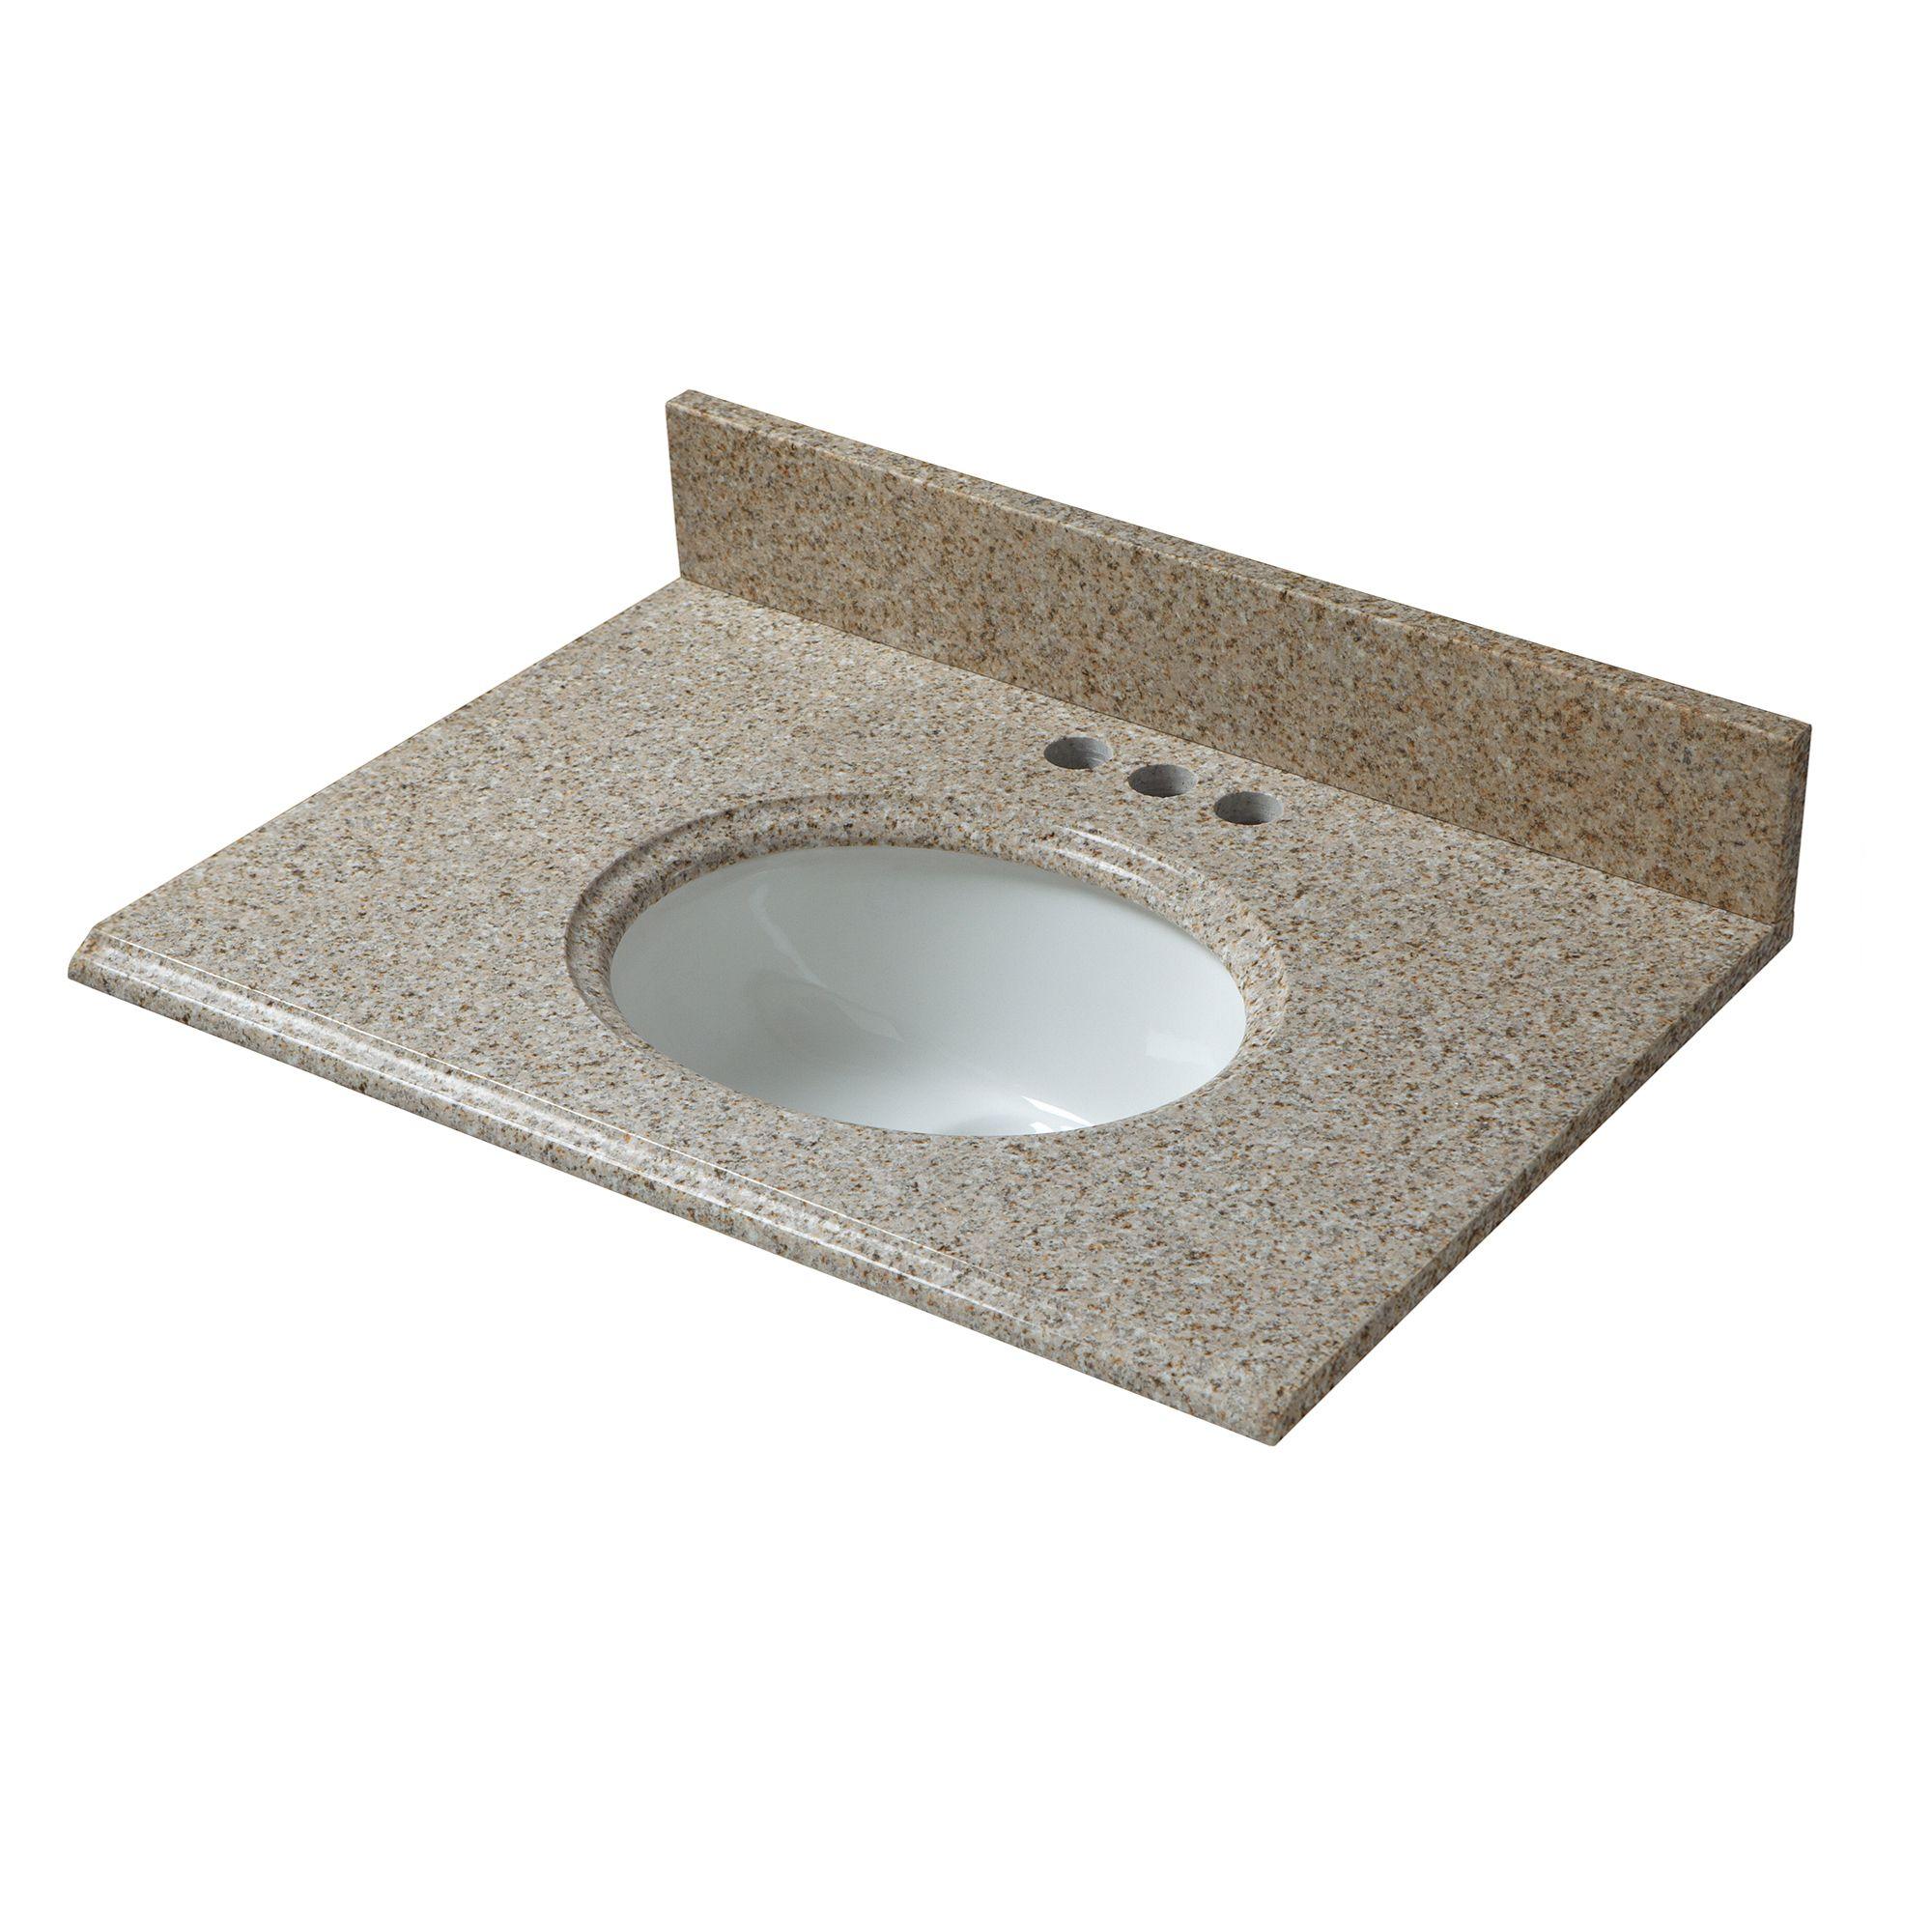 Cahaba Cahvt0138 61 In X 22 In Beige Granite Vanity Top With